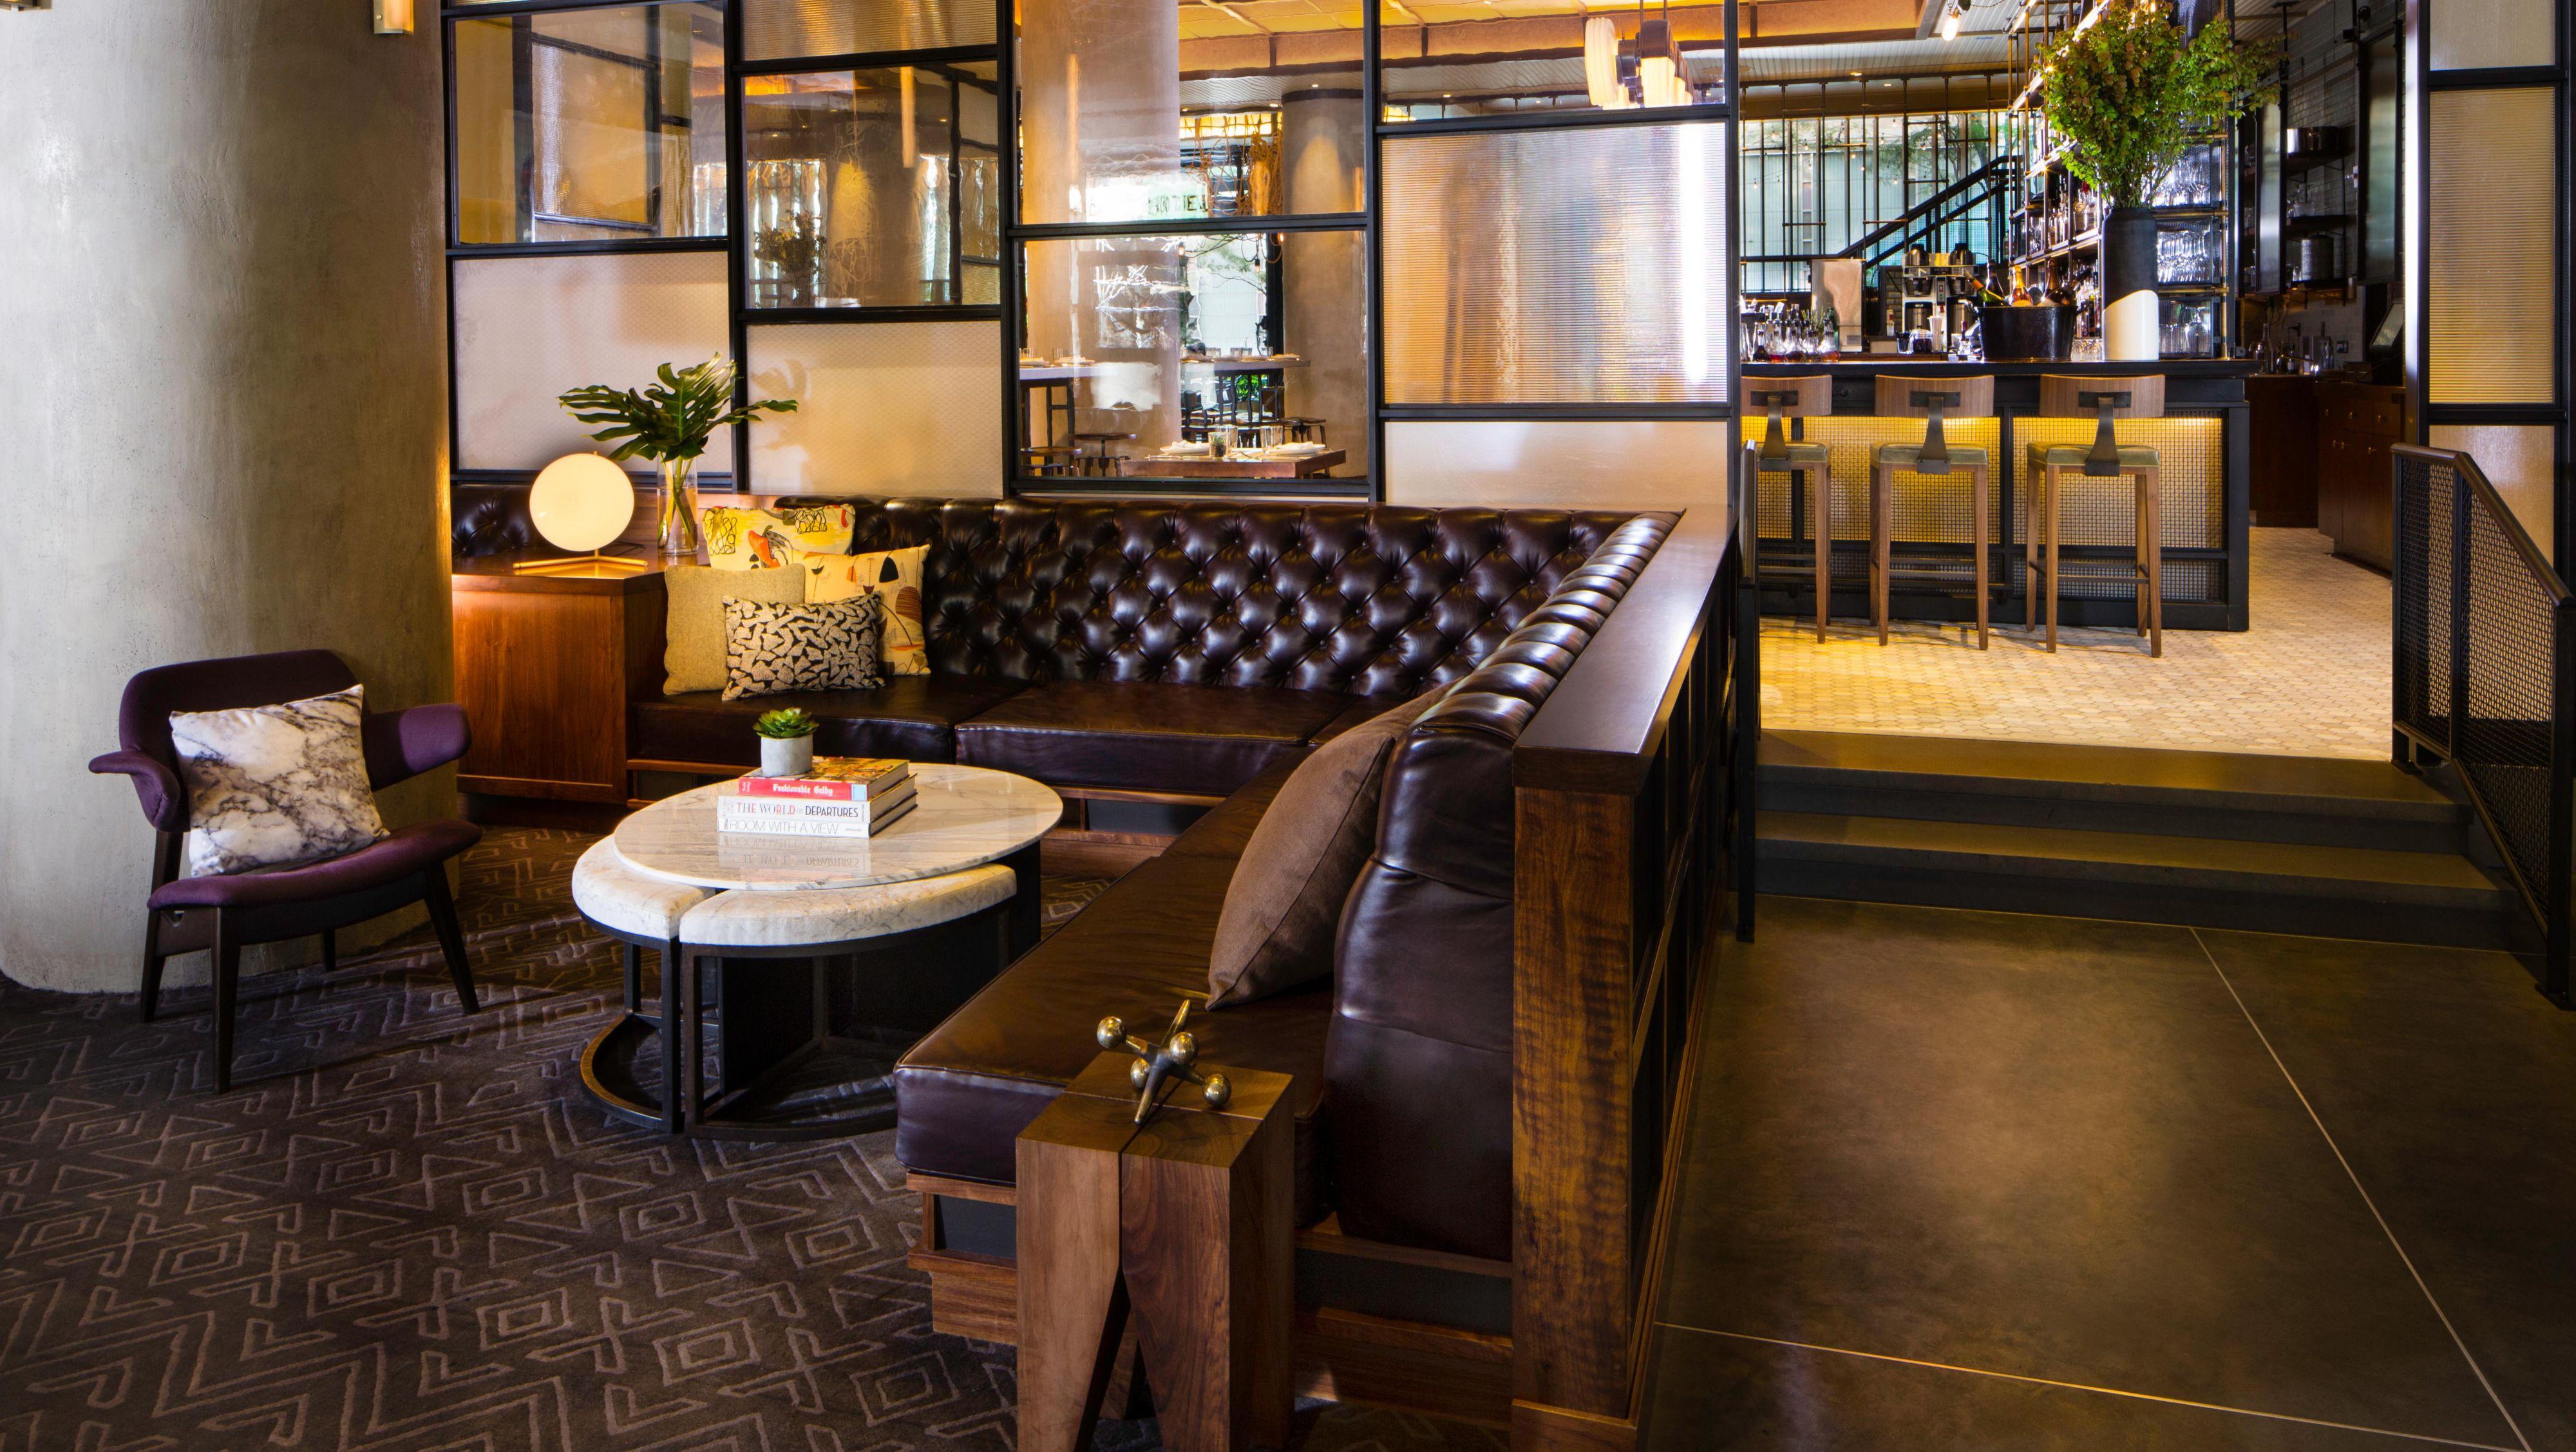 Kimpton Hotel Eventi in New York City | Kimpton Hotels